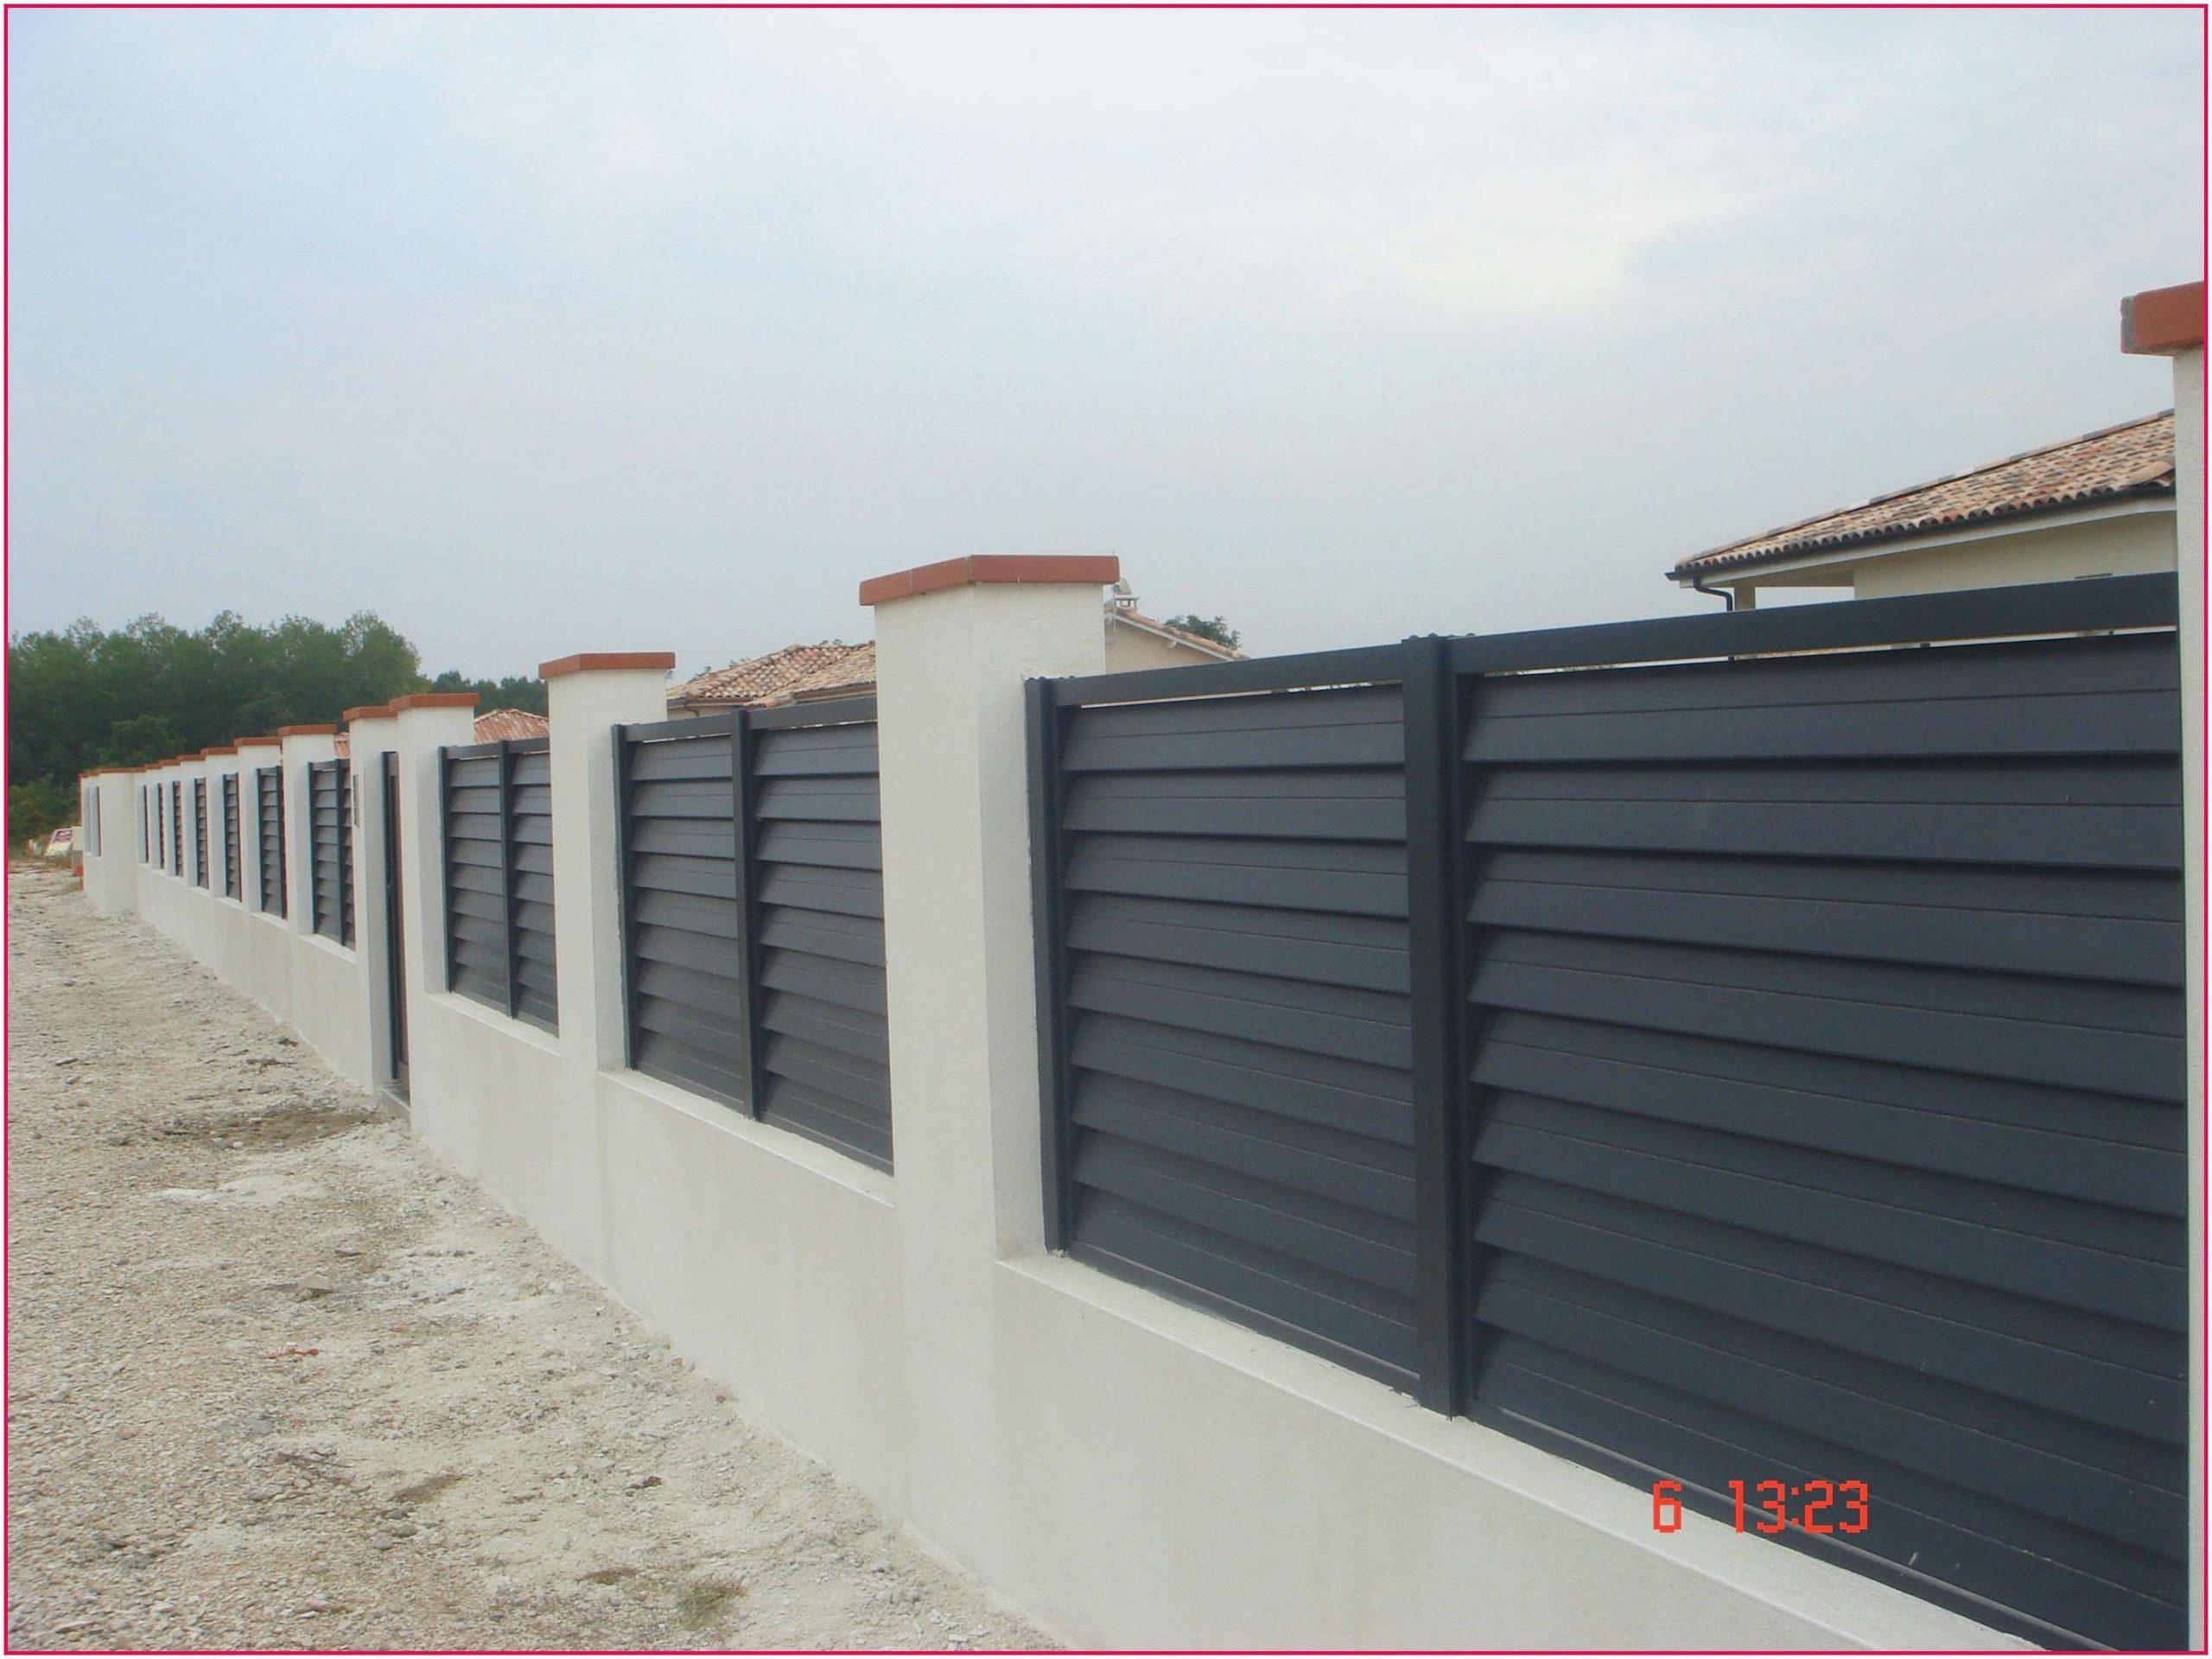 Montage Carport Bois Brico Depot Gamboahinestrosa Destine Carport Brico Cash Idees Conception Jardin Idees Conception Jardin